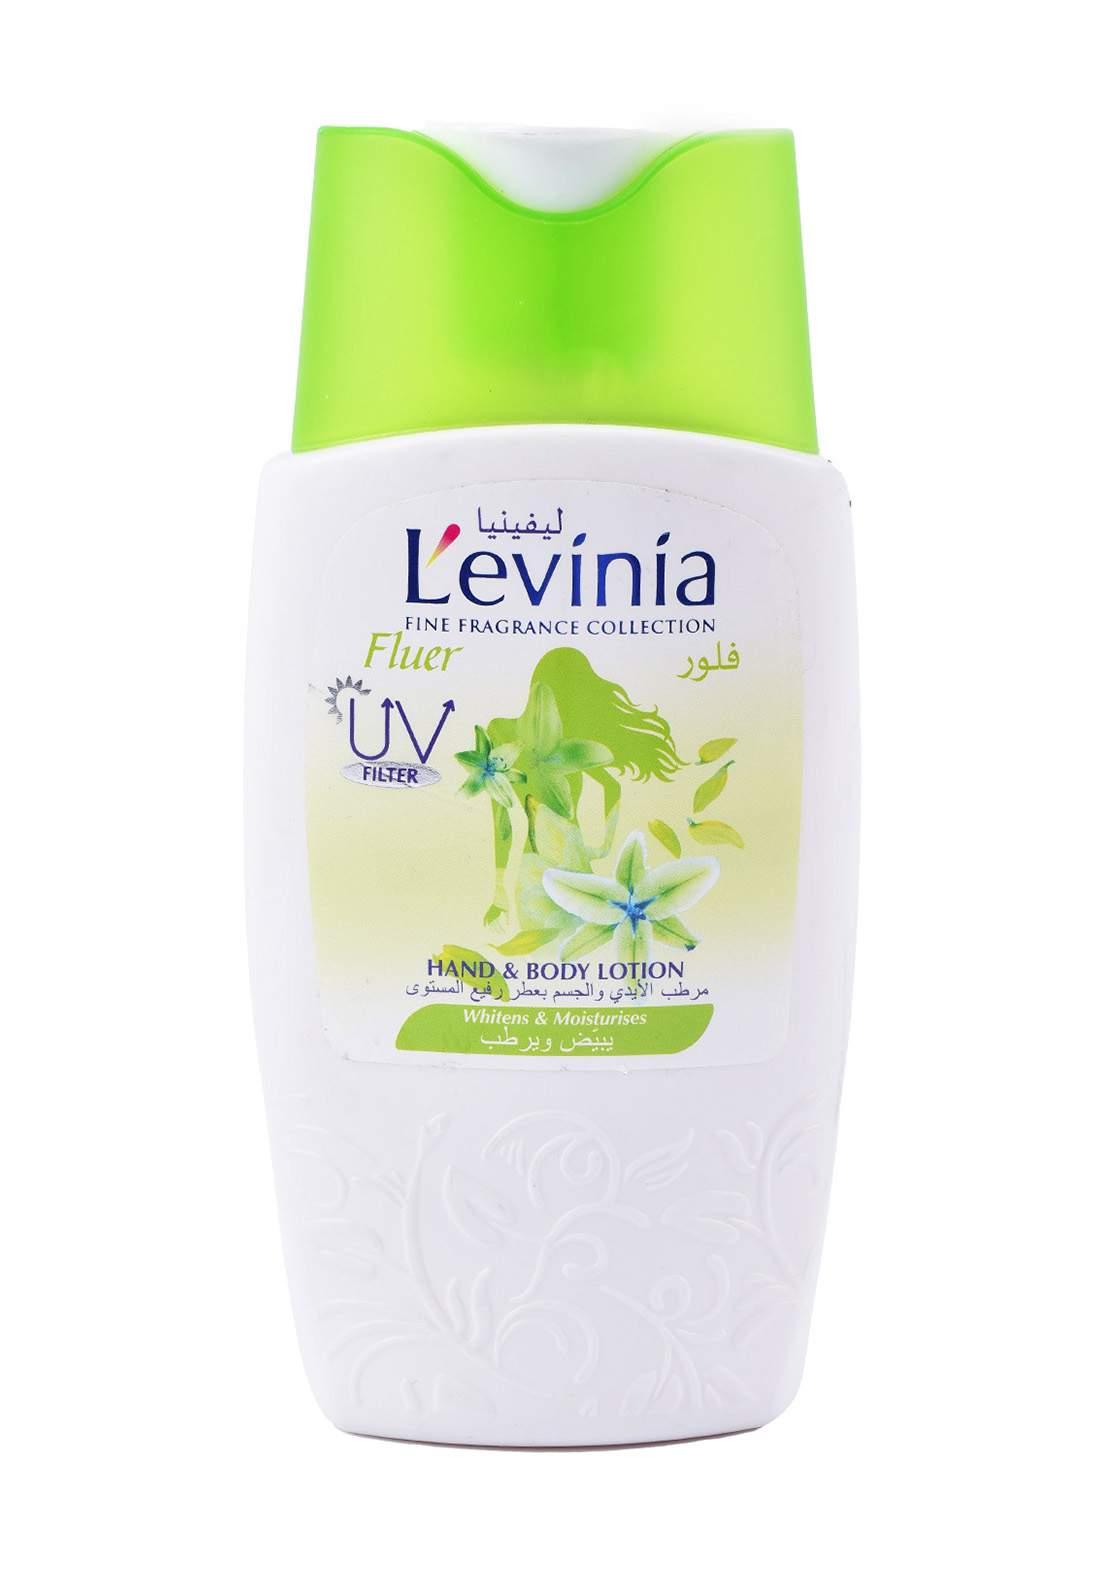 Levinia Fluer Hand & Body Lotion 200gm مرطب الجسم واليدين